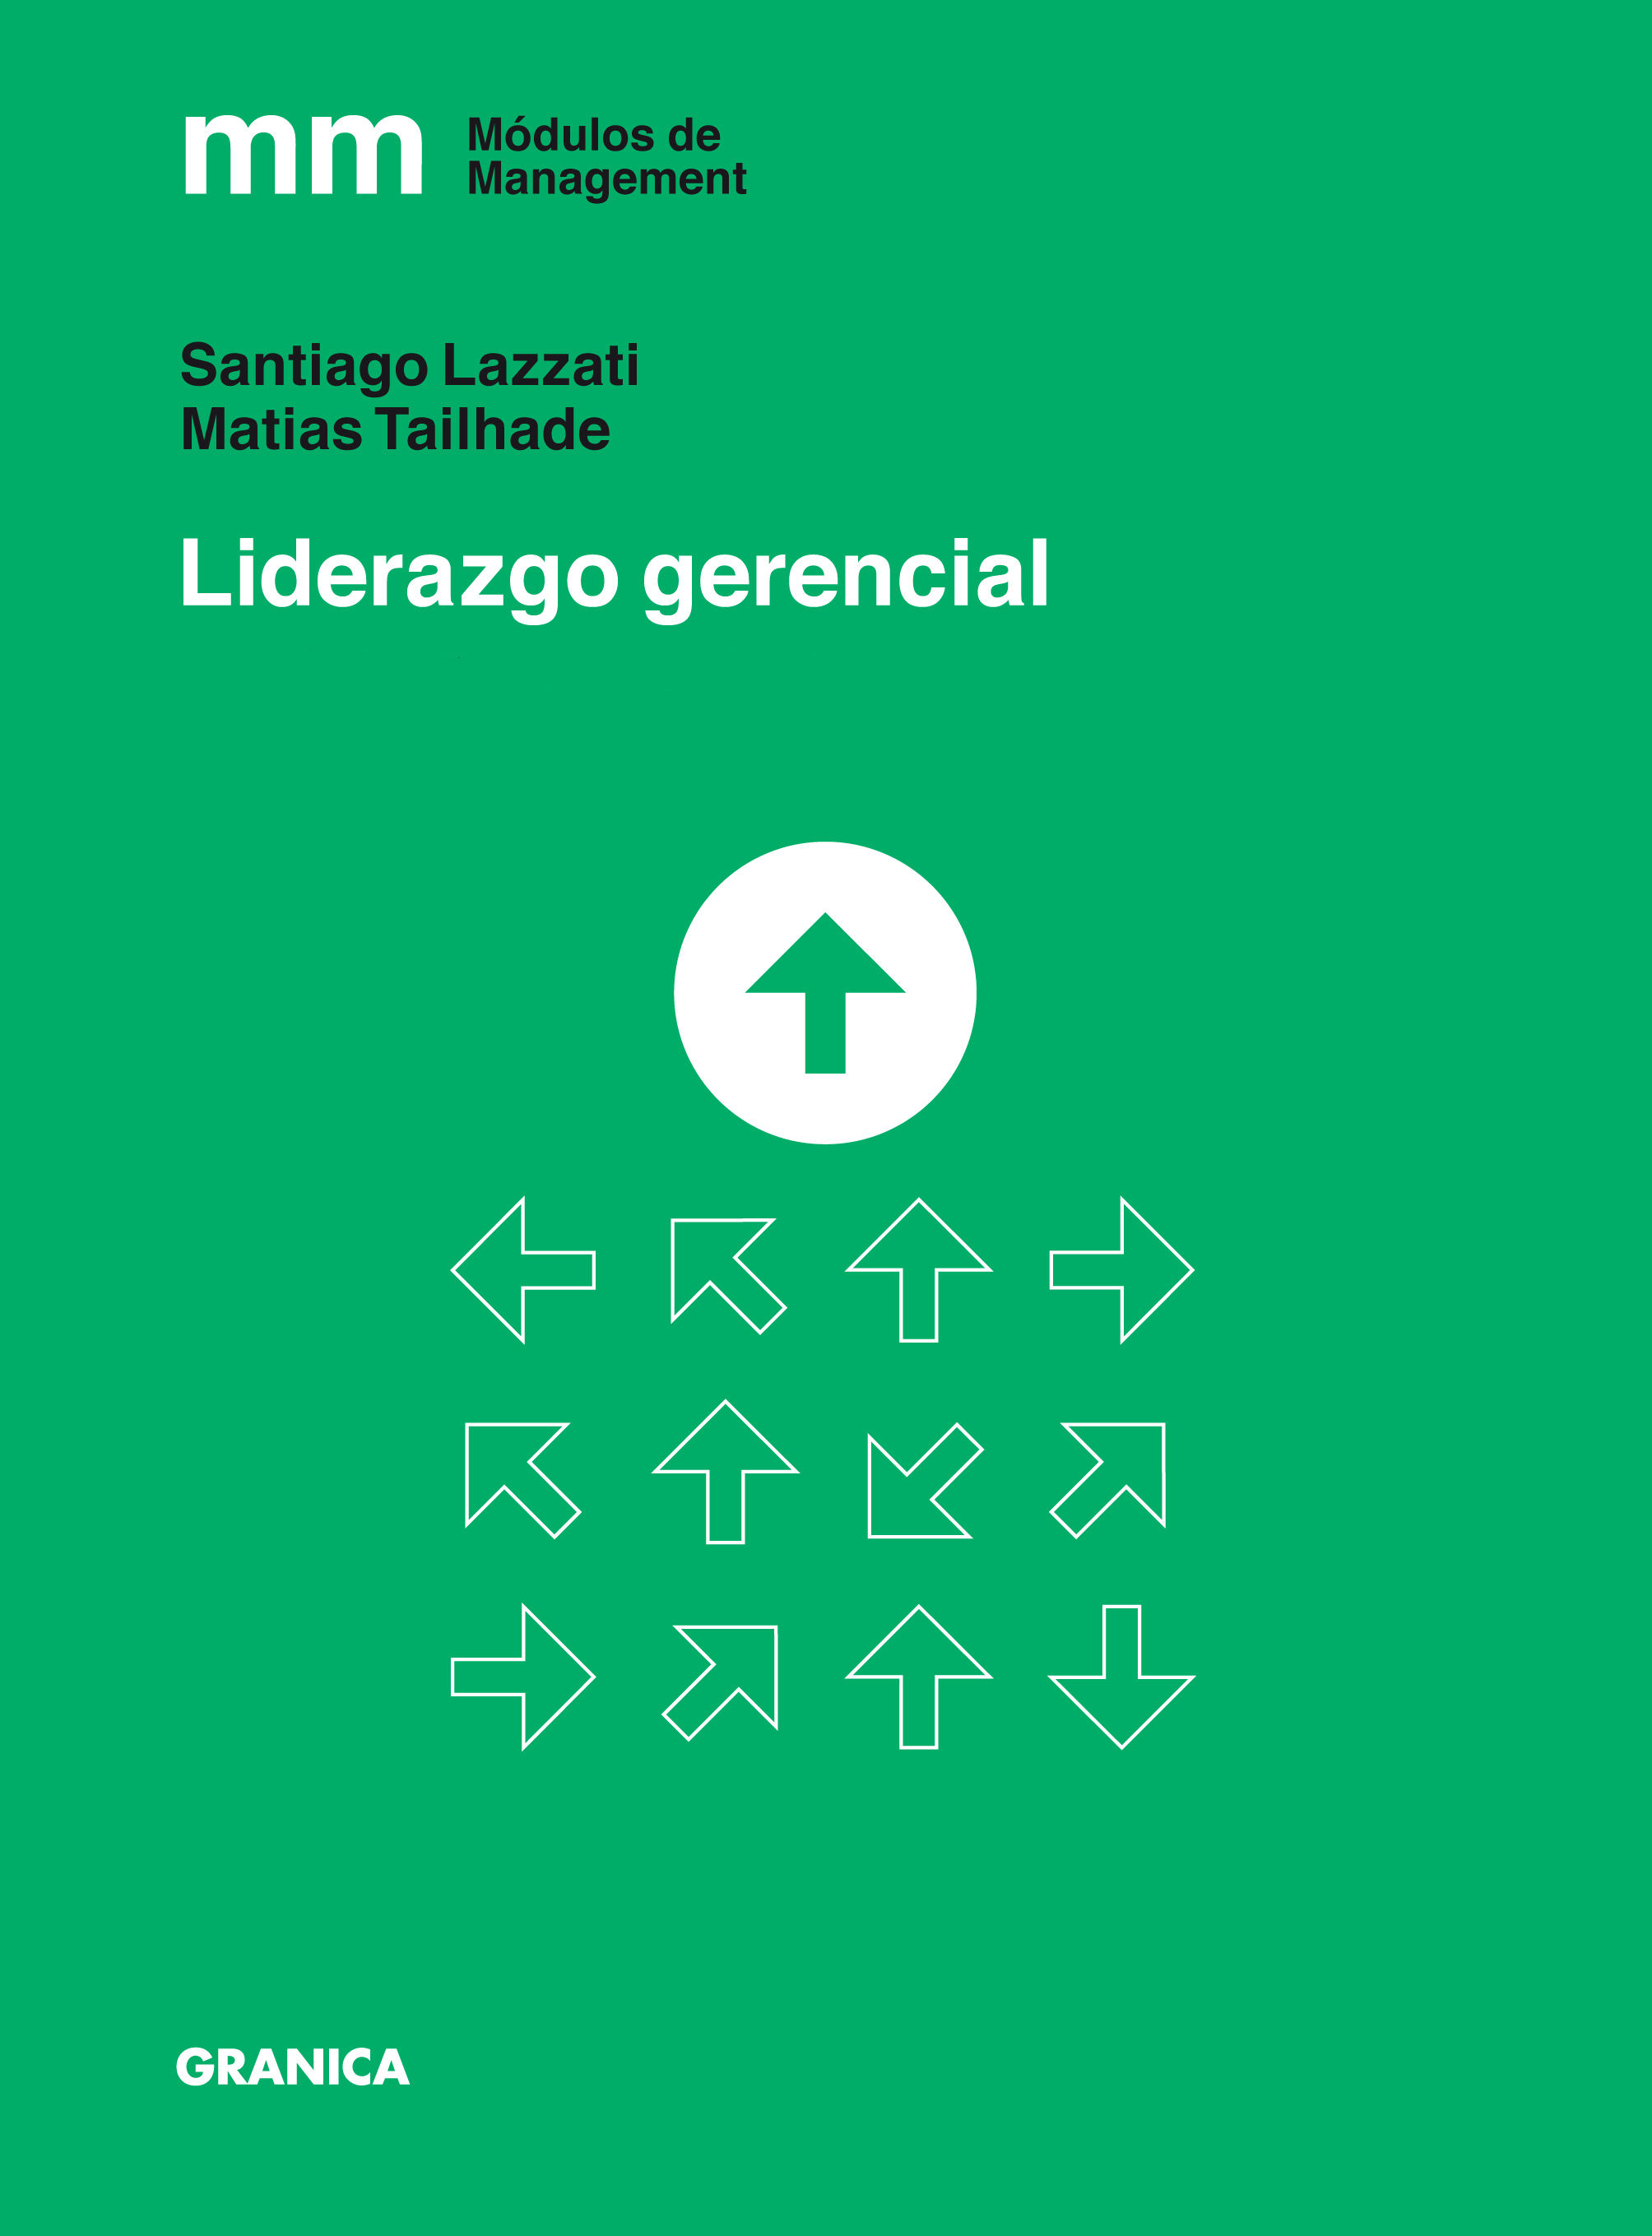 LIDERAZGO GERENCIAL